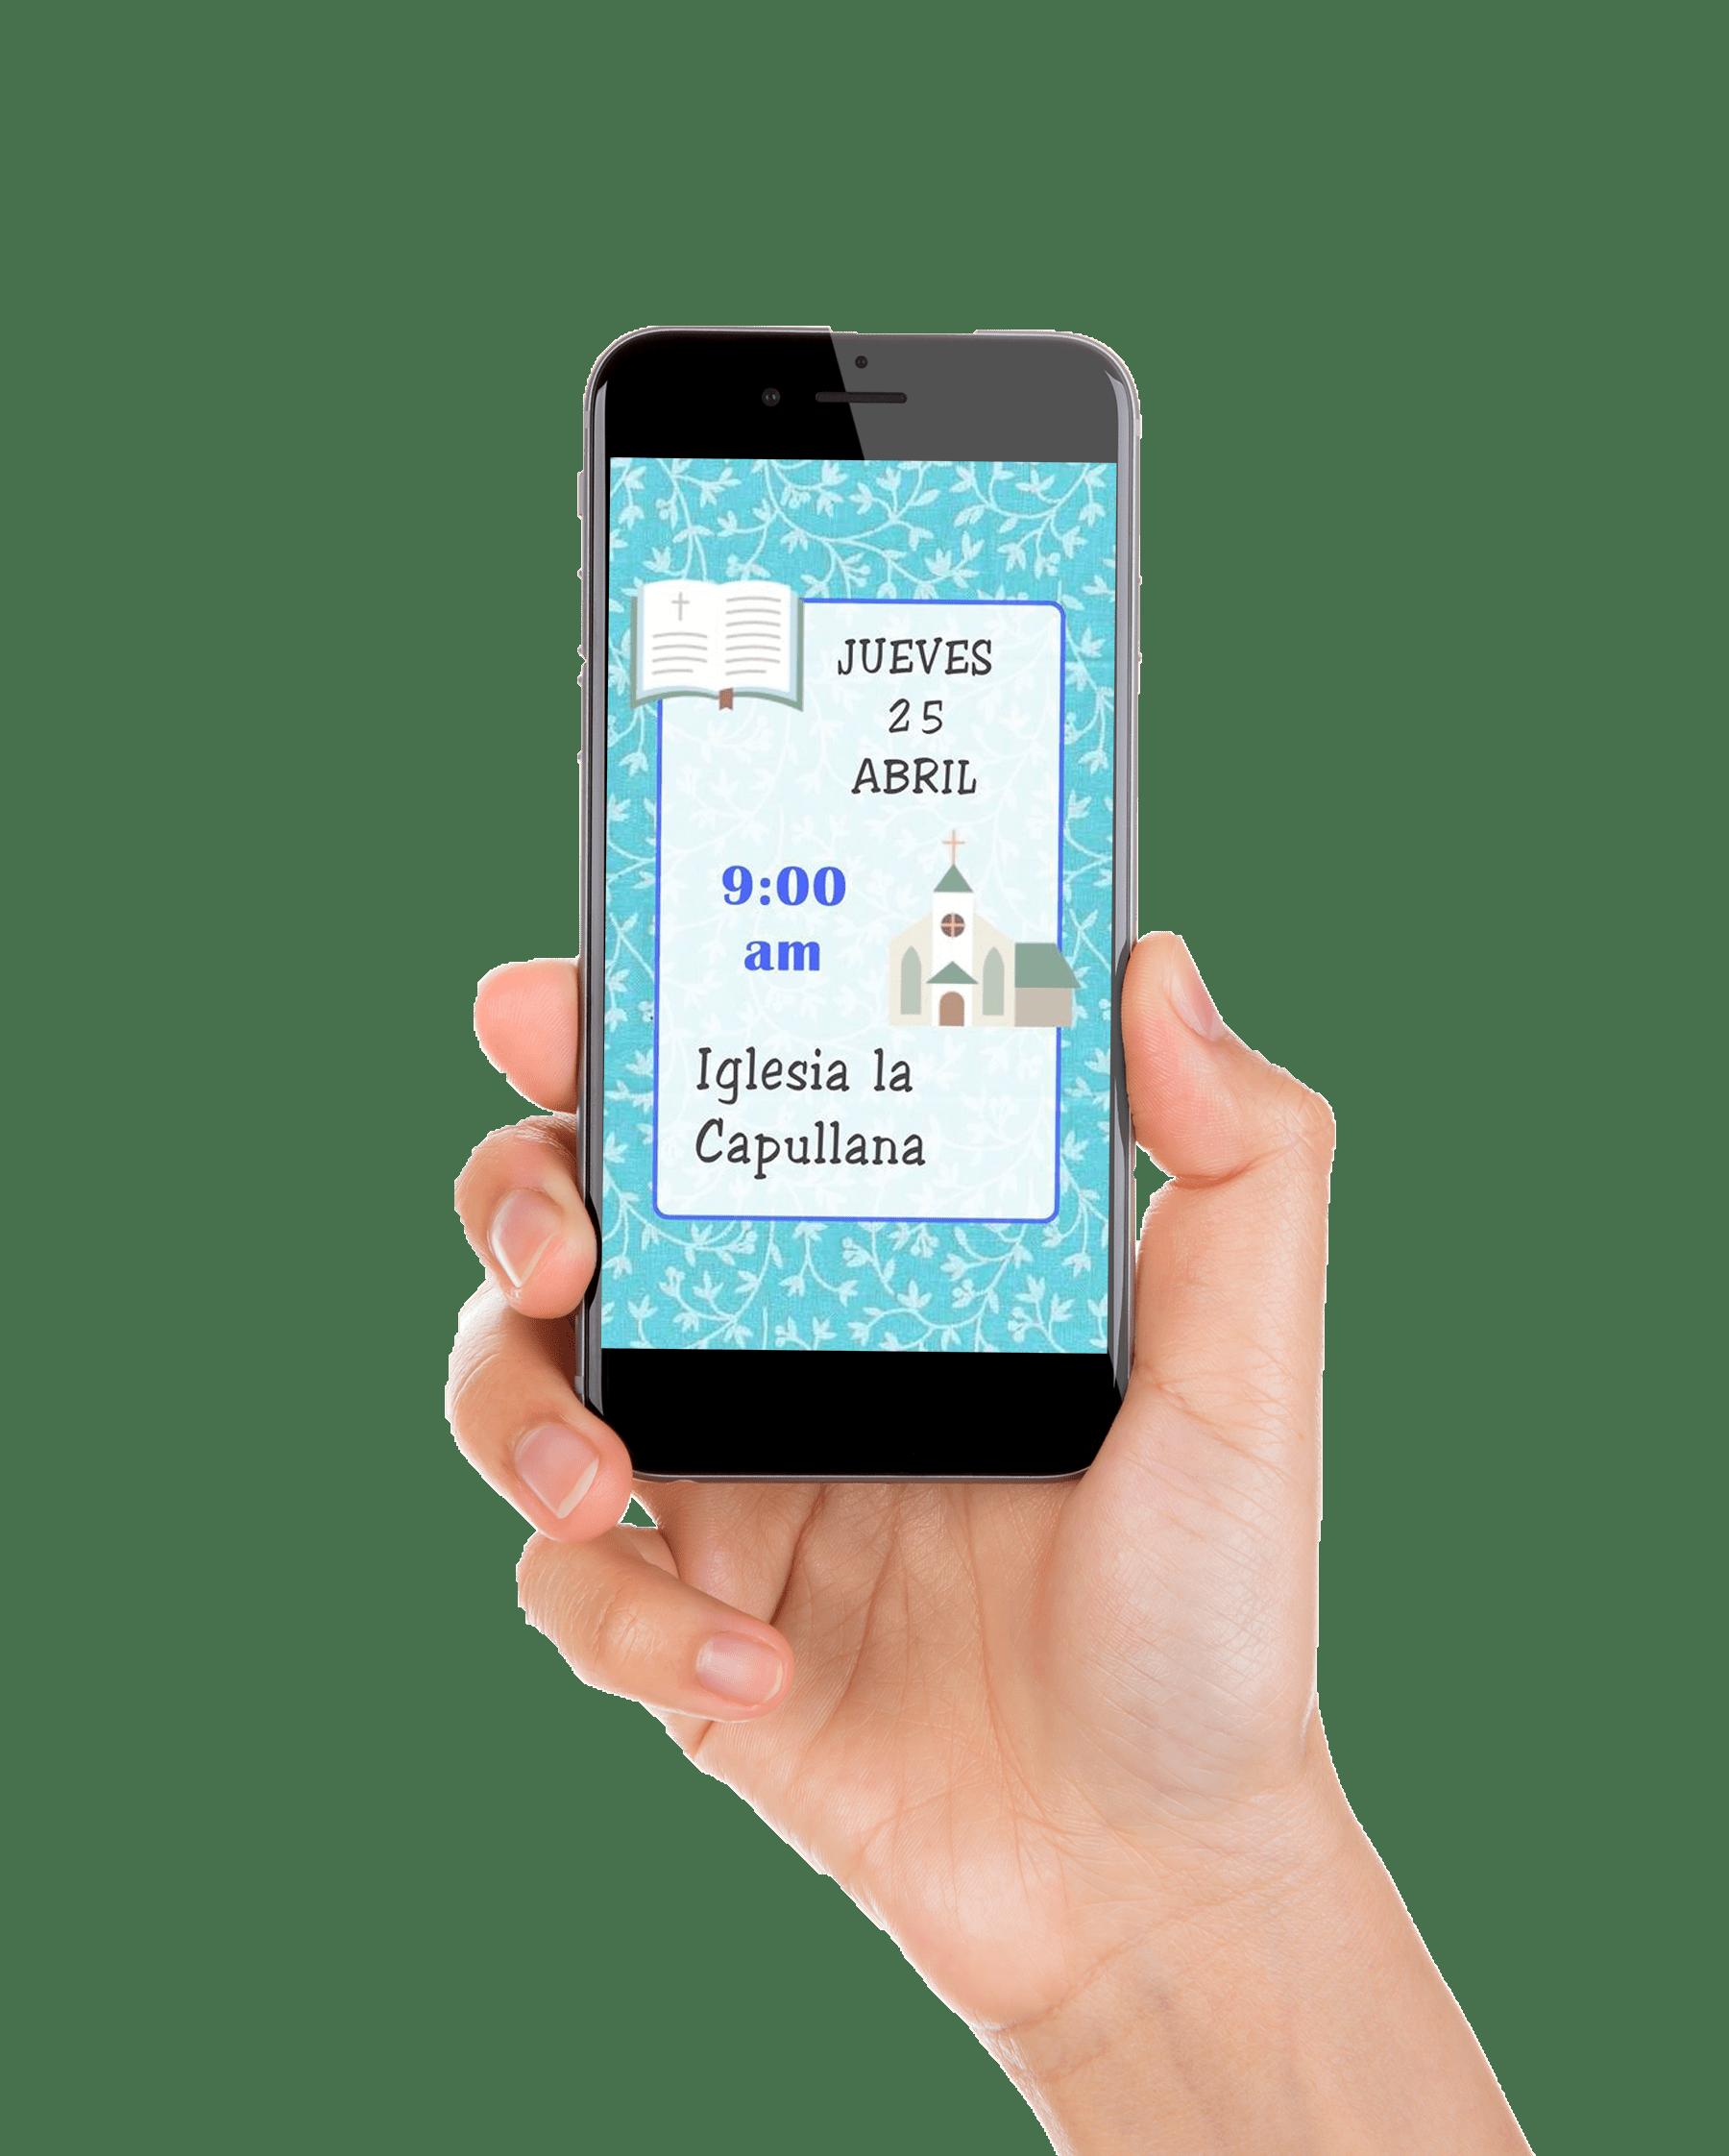 tarjetas de invitacion virtuales